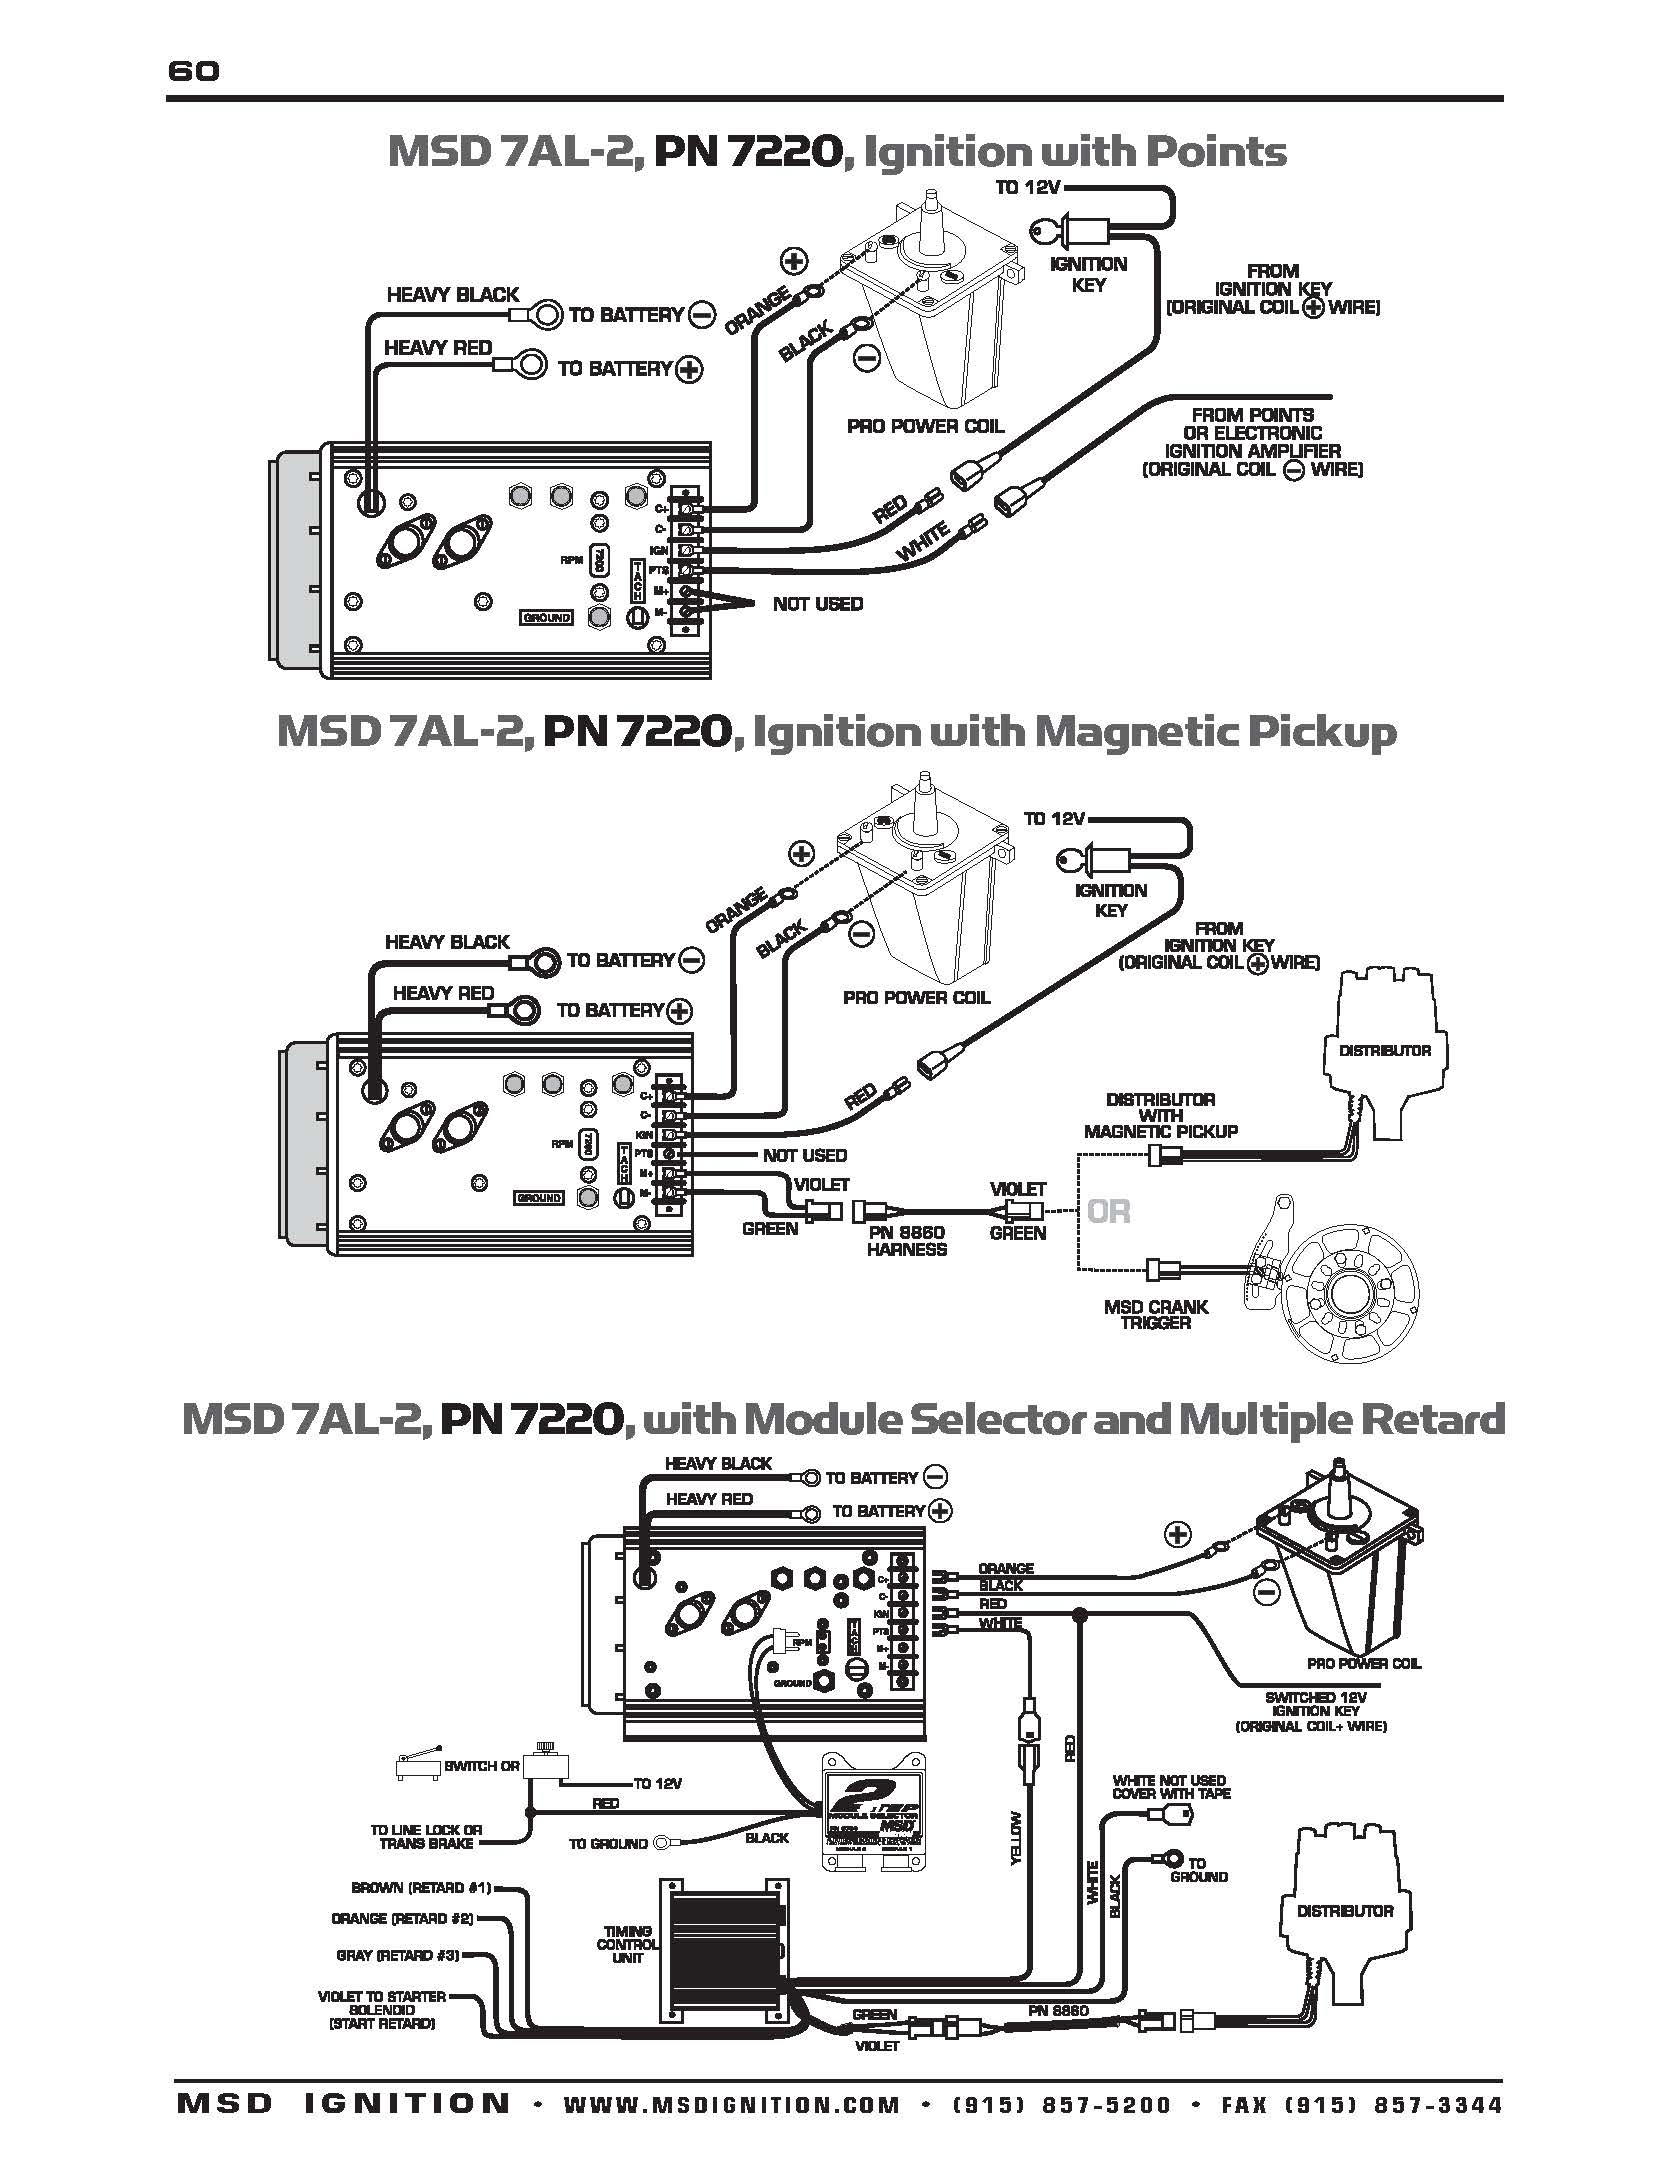 msd ignition wiring diagram rw 9601  msd ignition wiring diagrams msd ignition wiring diagram 6al rw 9601  msd ignition wiring diagrams